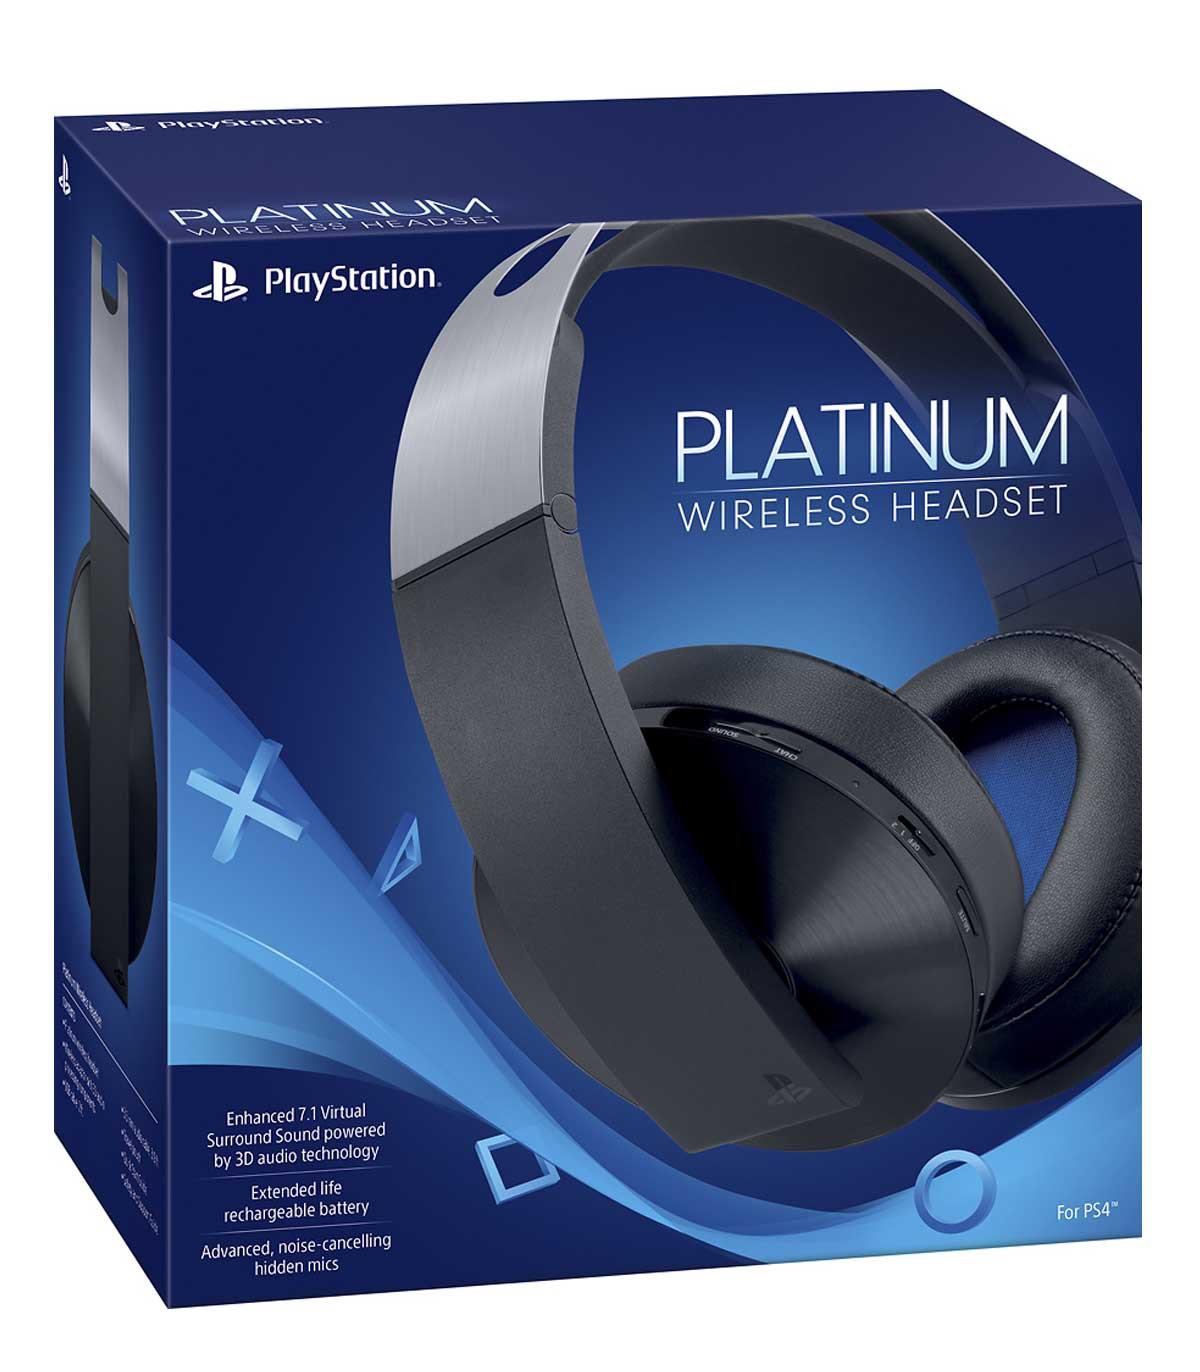 هدست پلاتینیوم سونی PS4 Platinum Wireless Headset